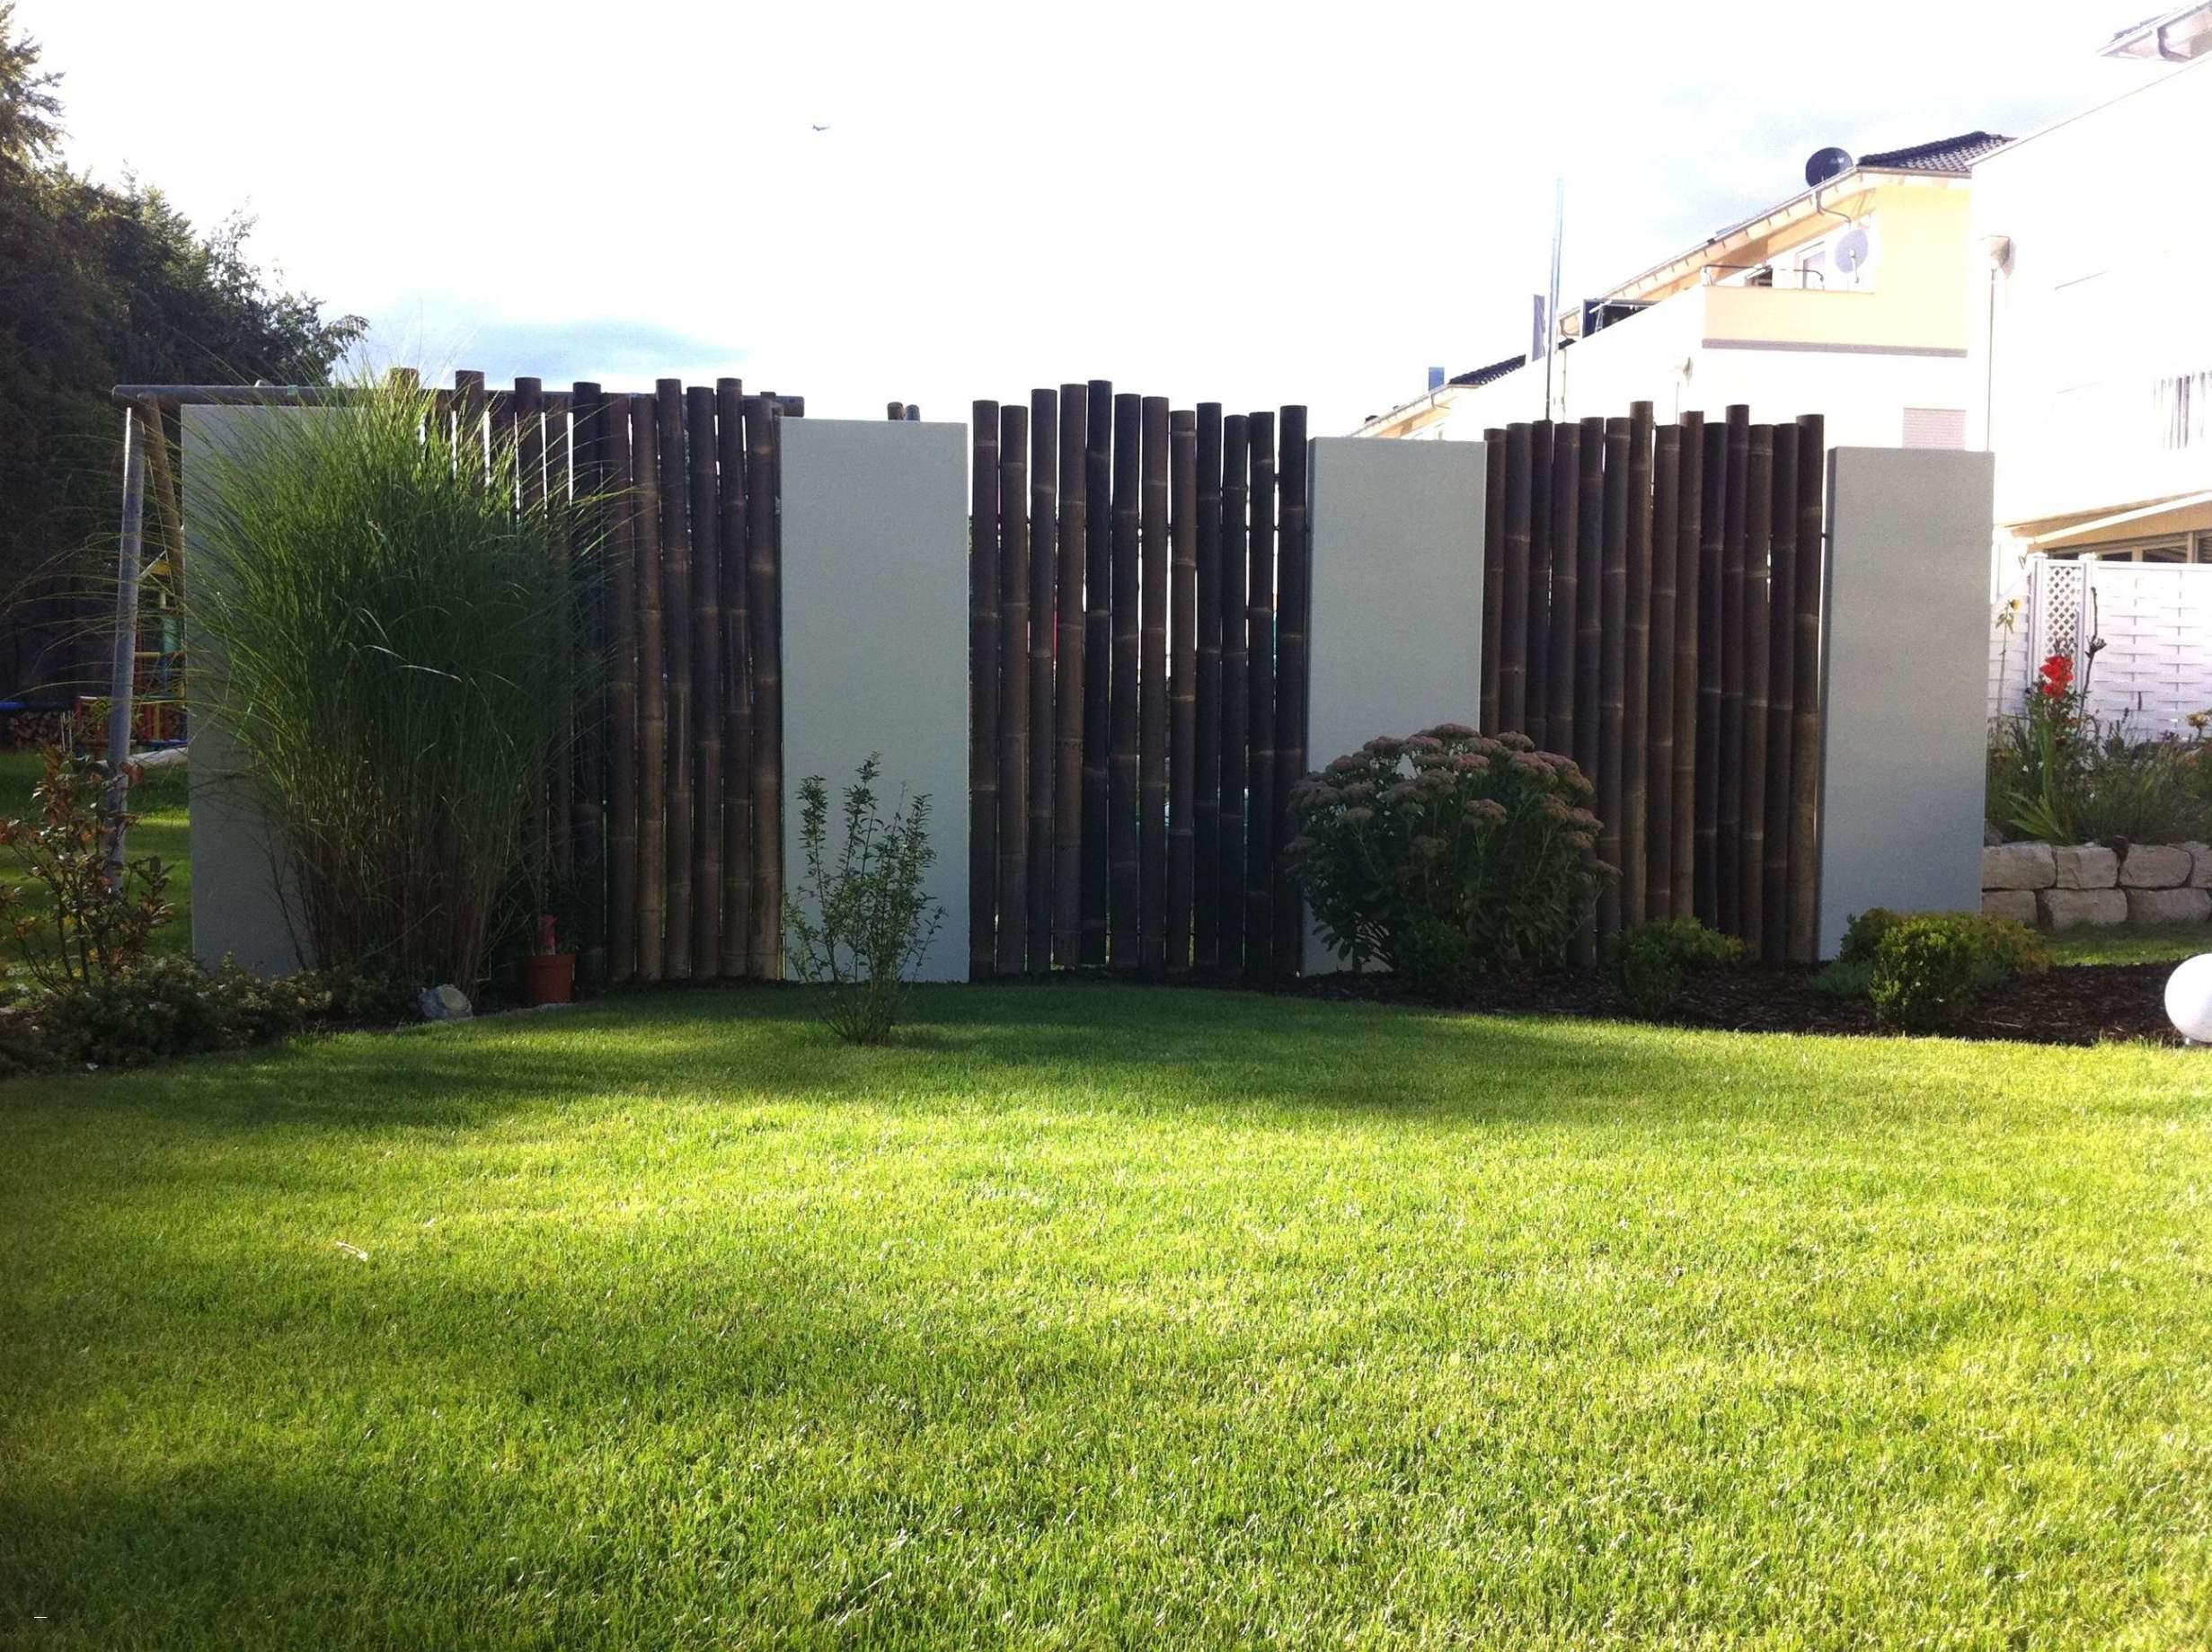 garten sichtschutz bambus neu terrasse pflanzen sichtschutz temobardz home blog of garten sichtschutz bambus